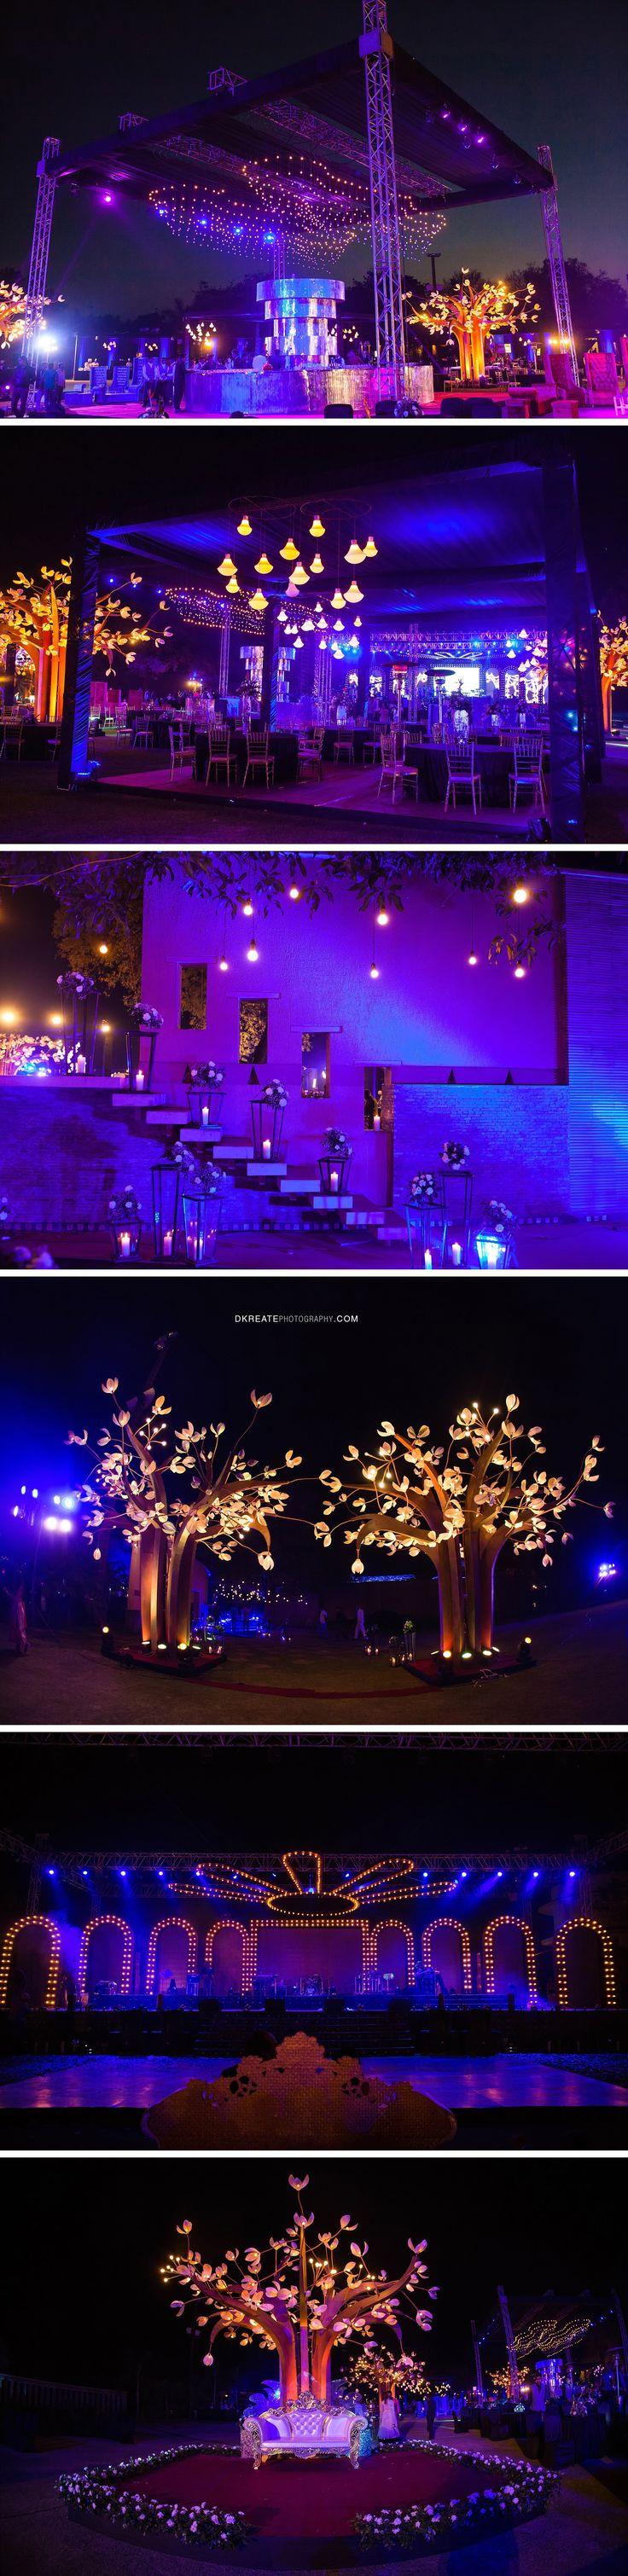 Indian Wedding Decor Inspiration | Grand Cocktail Sangeet Decor. Light tree. Big performance stage. Stage for the brie and groom. Fresh flower, lanterns, Candles, Bar decor inspiration. Big Fat Indian Wedding Purple Pink Gold White #wedmegood #maharaniwedding #Bigfatsouthasainwedding